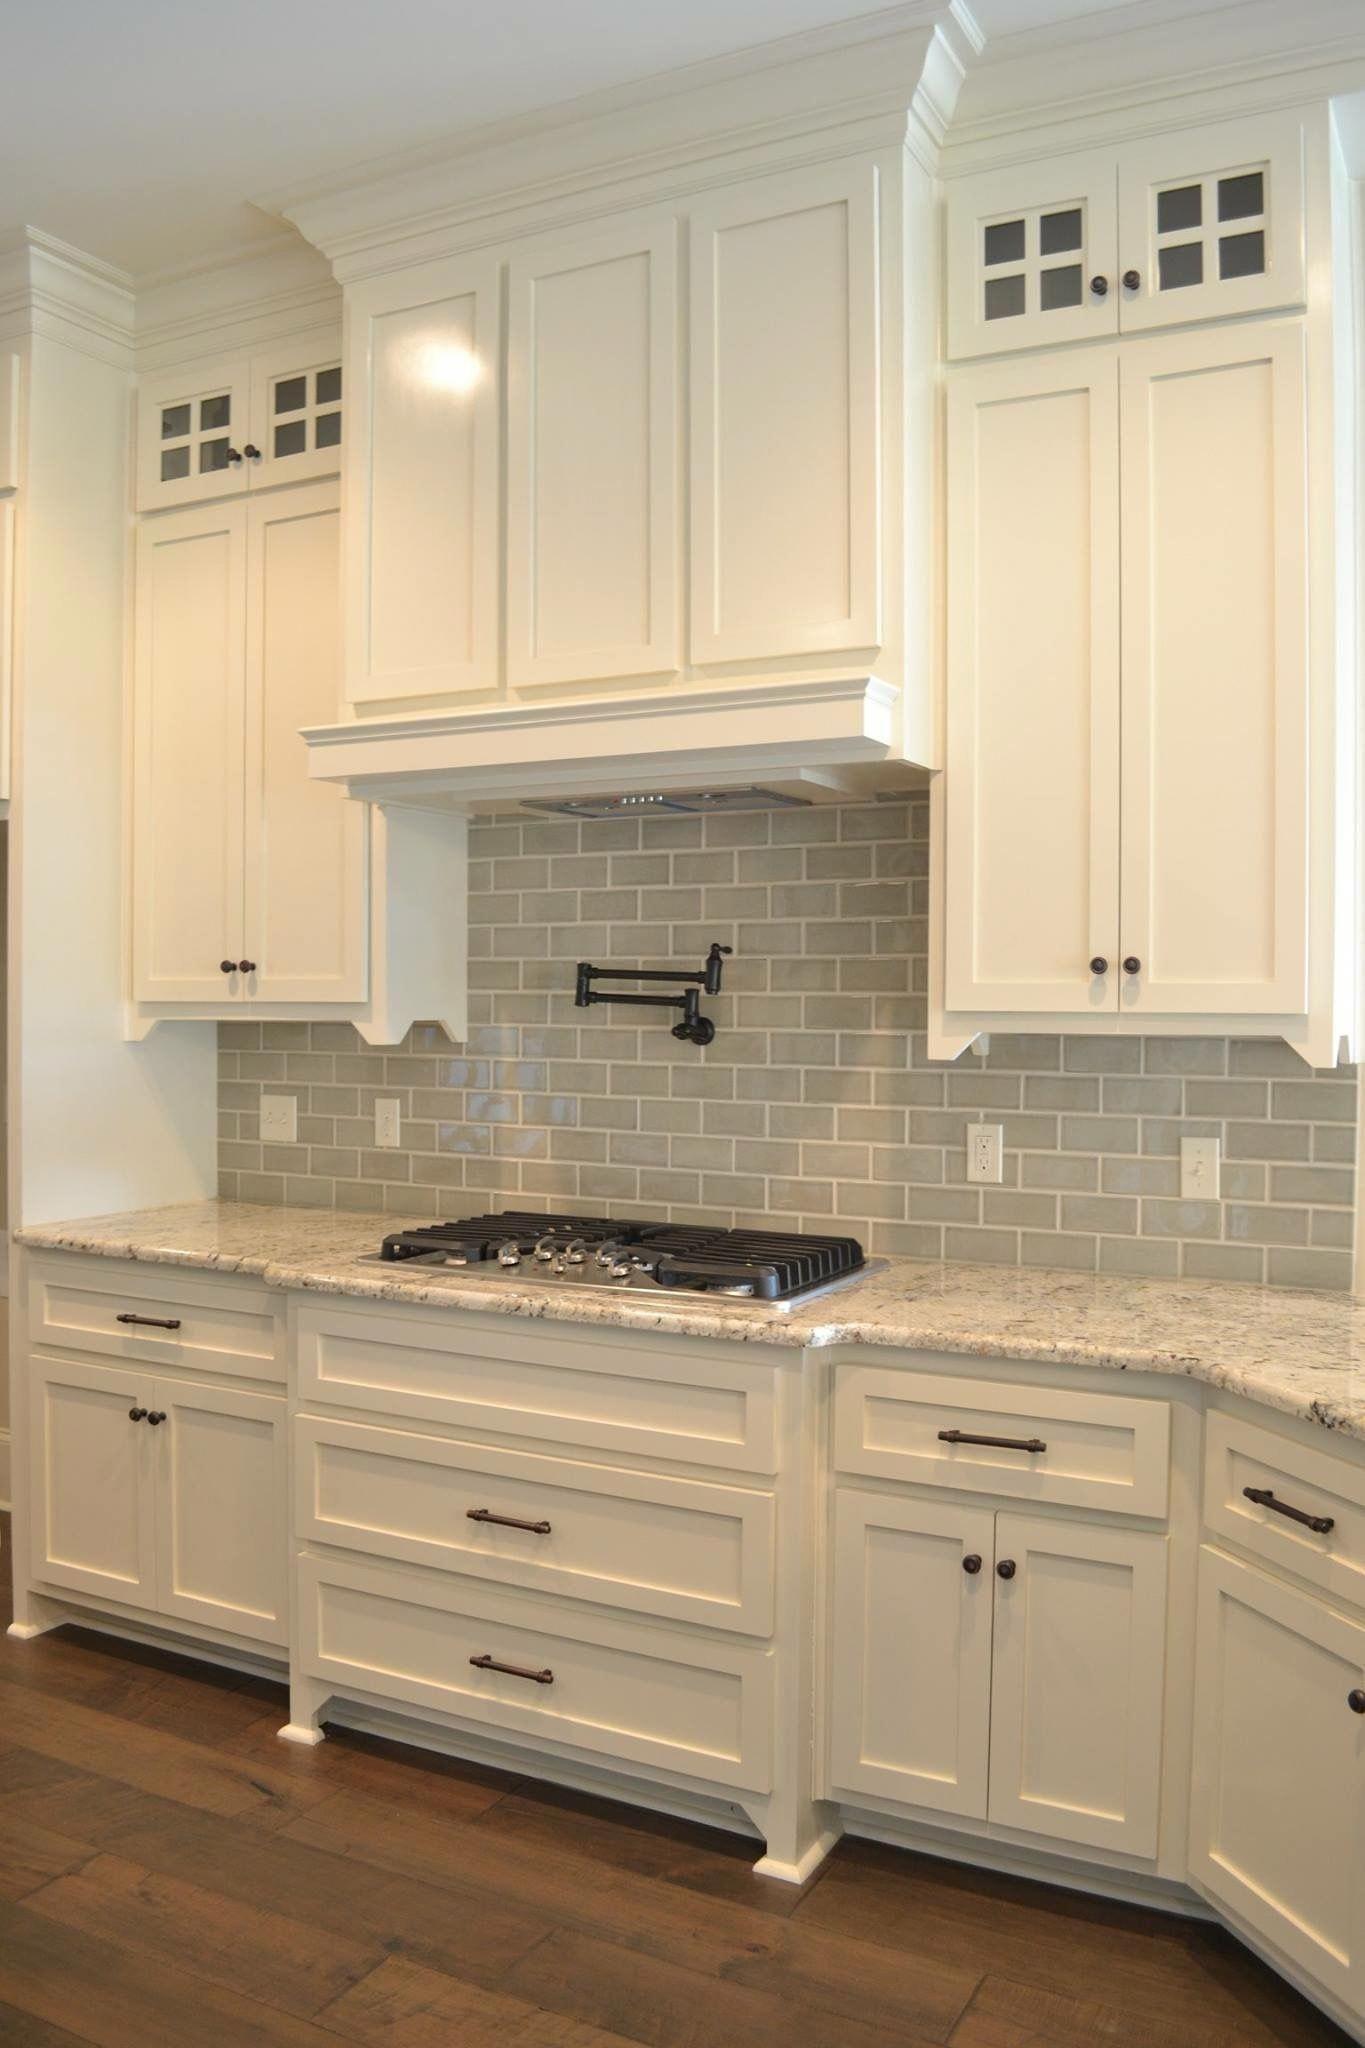 Excellent Photographs White Kitchen Remodel Suggestions Kitchen Cabinets Decor White Kitchen Design Kitchen Renovation